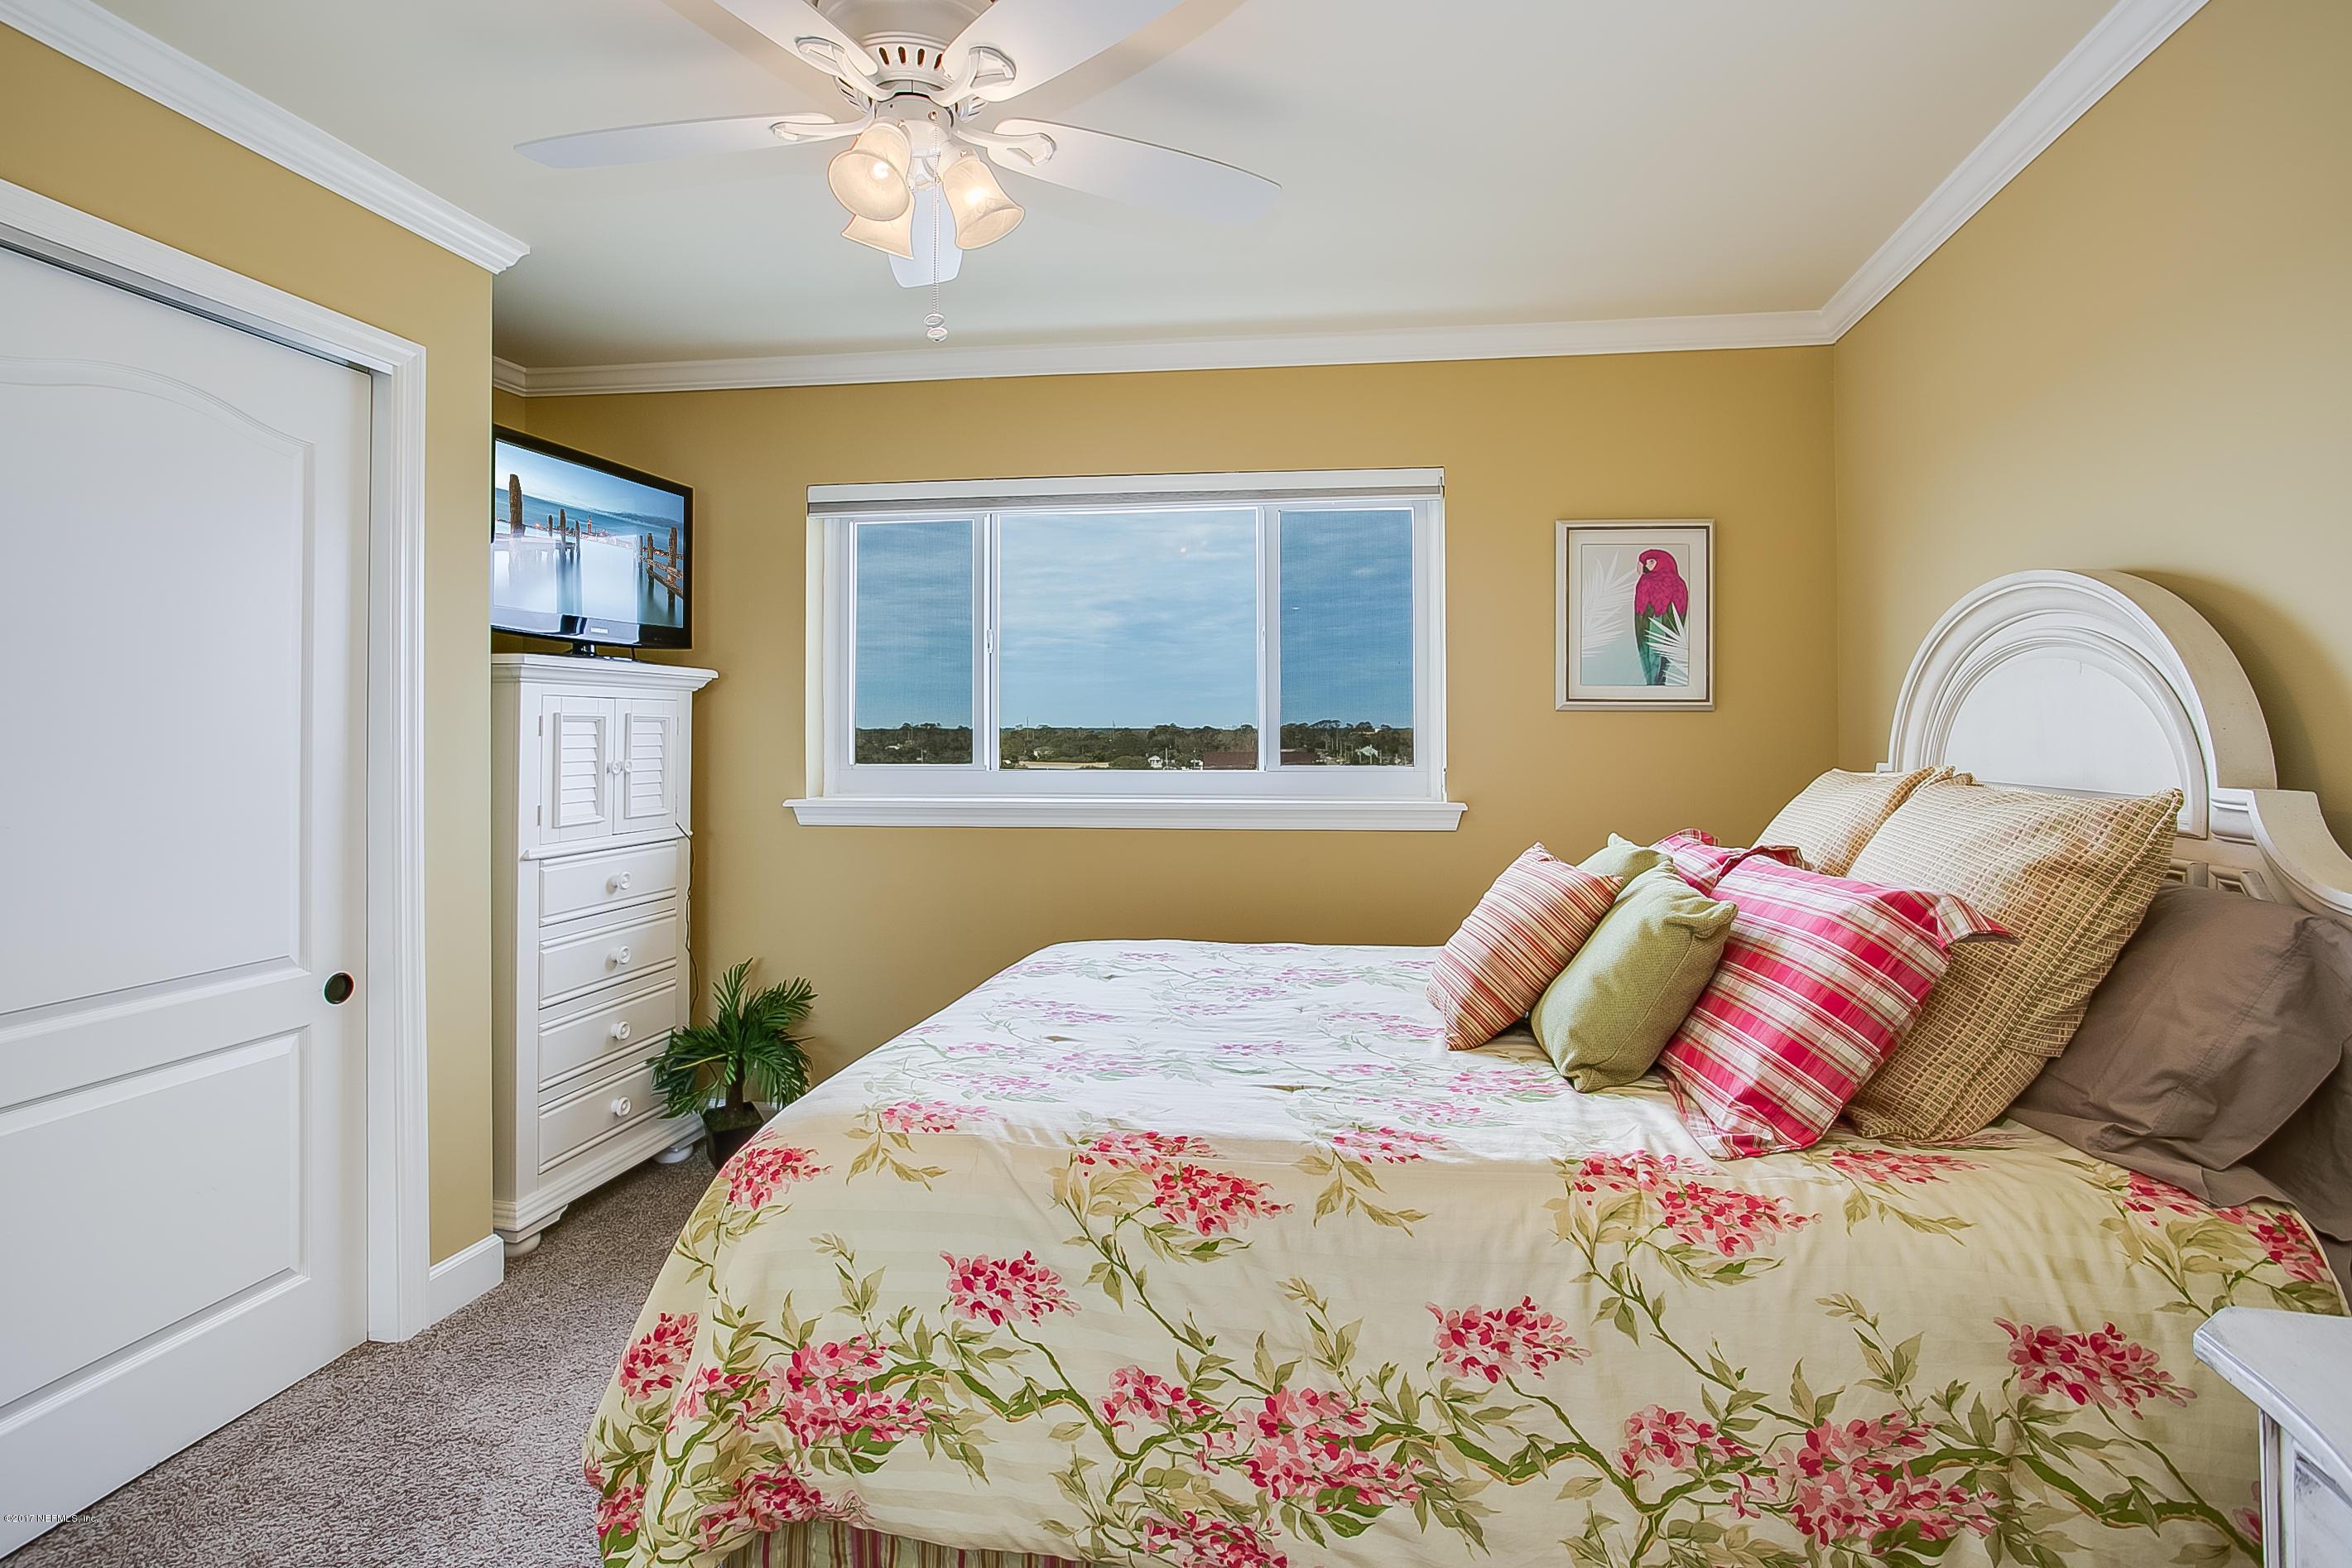 1601 OCEAN, JACKSONVILLE BEACH, FLORIDA 32250, 2 Bedrooms Bedrooms, ,2 BathroomsBathrooms,Condo,For sale,OCEAN,1008460